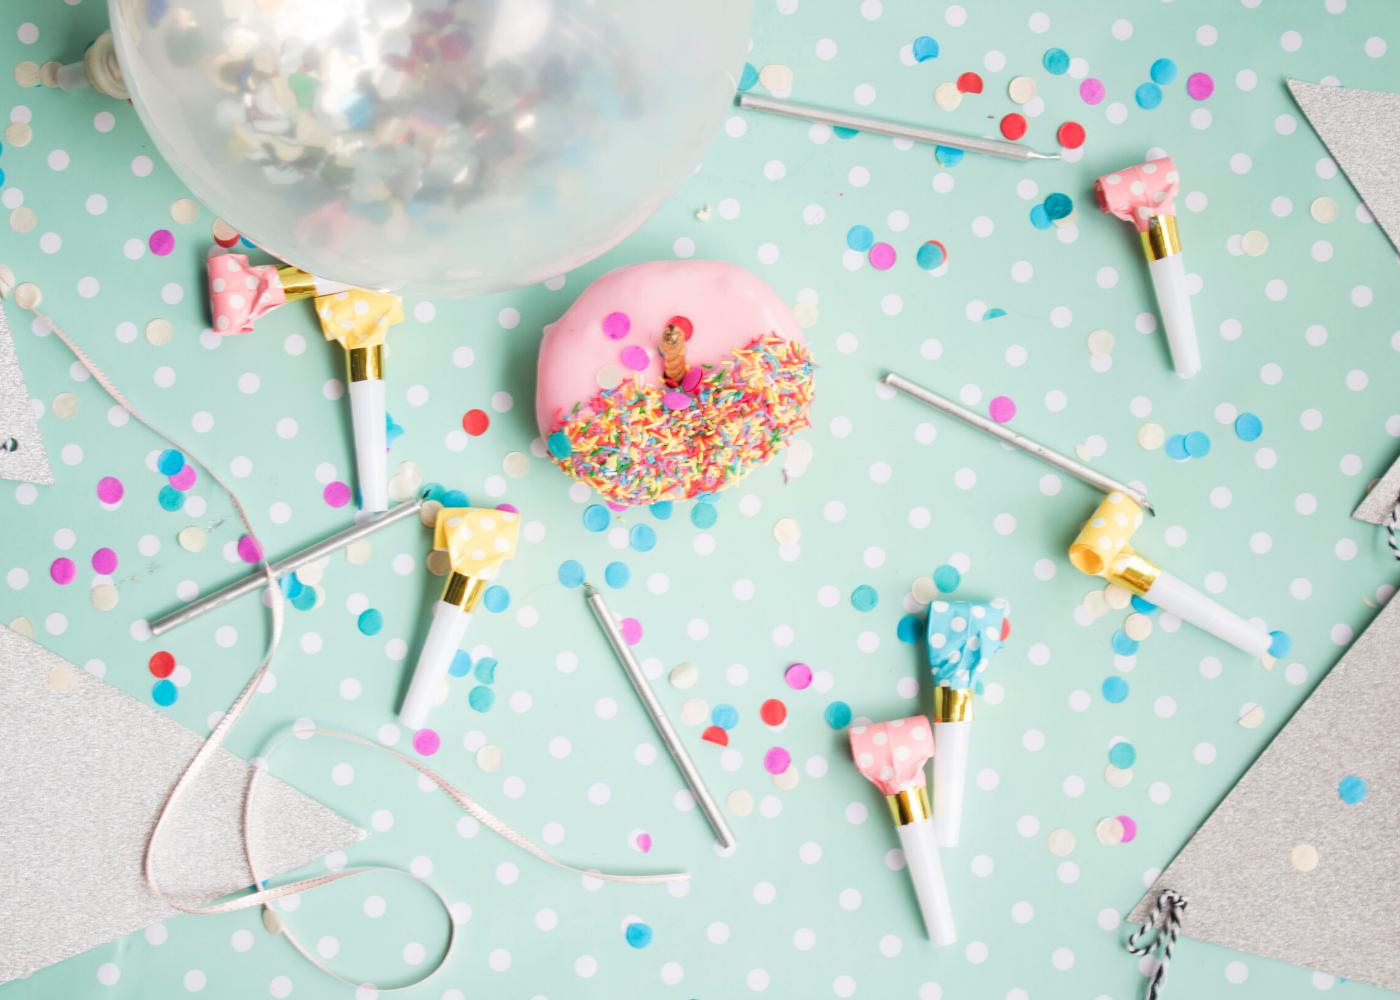 pastel donut sprinklers balloon